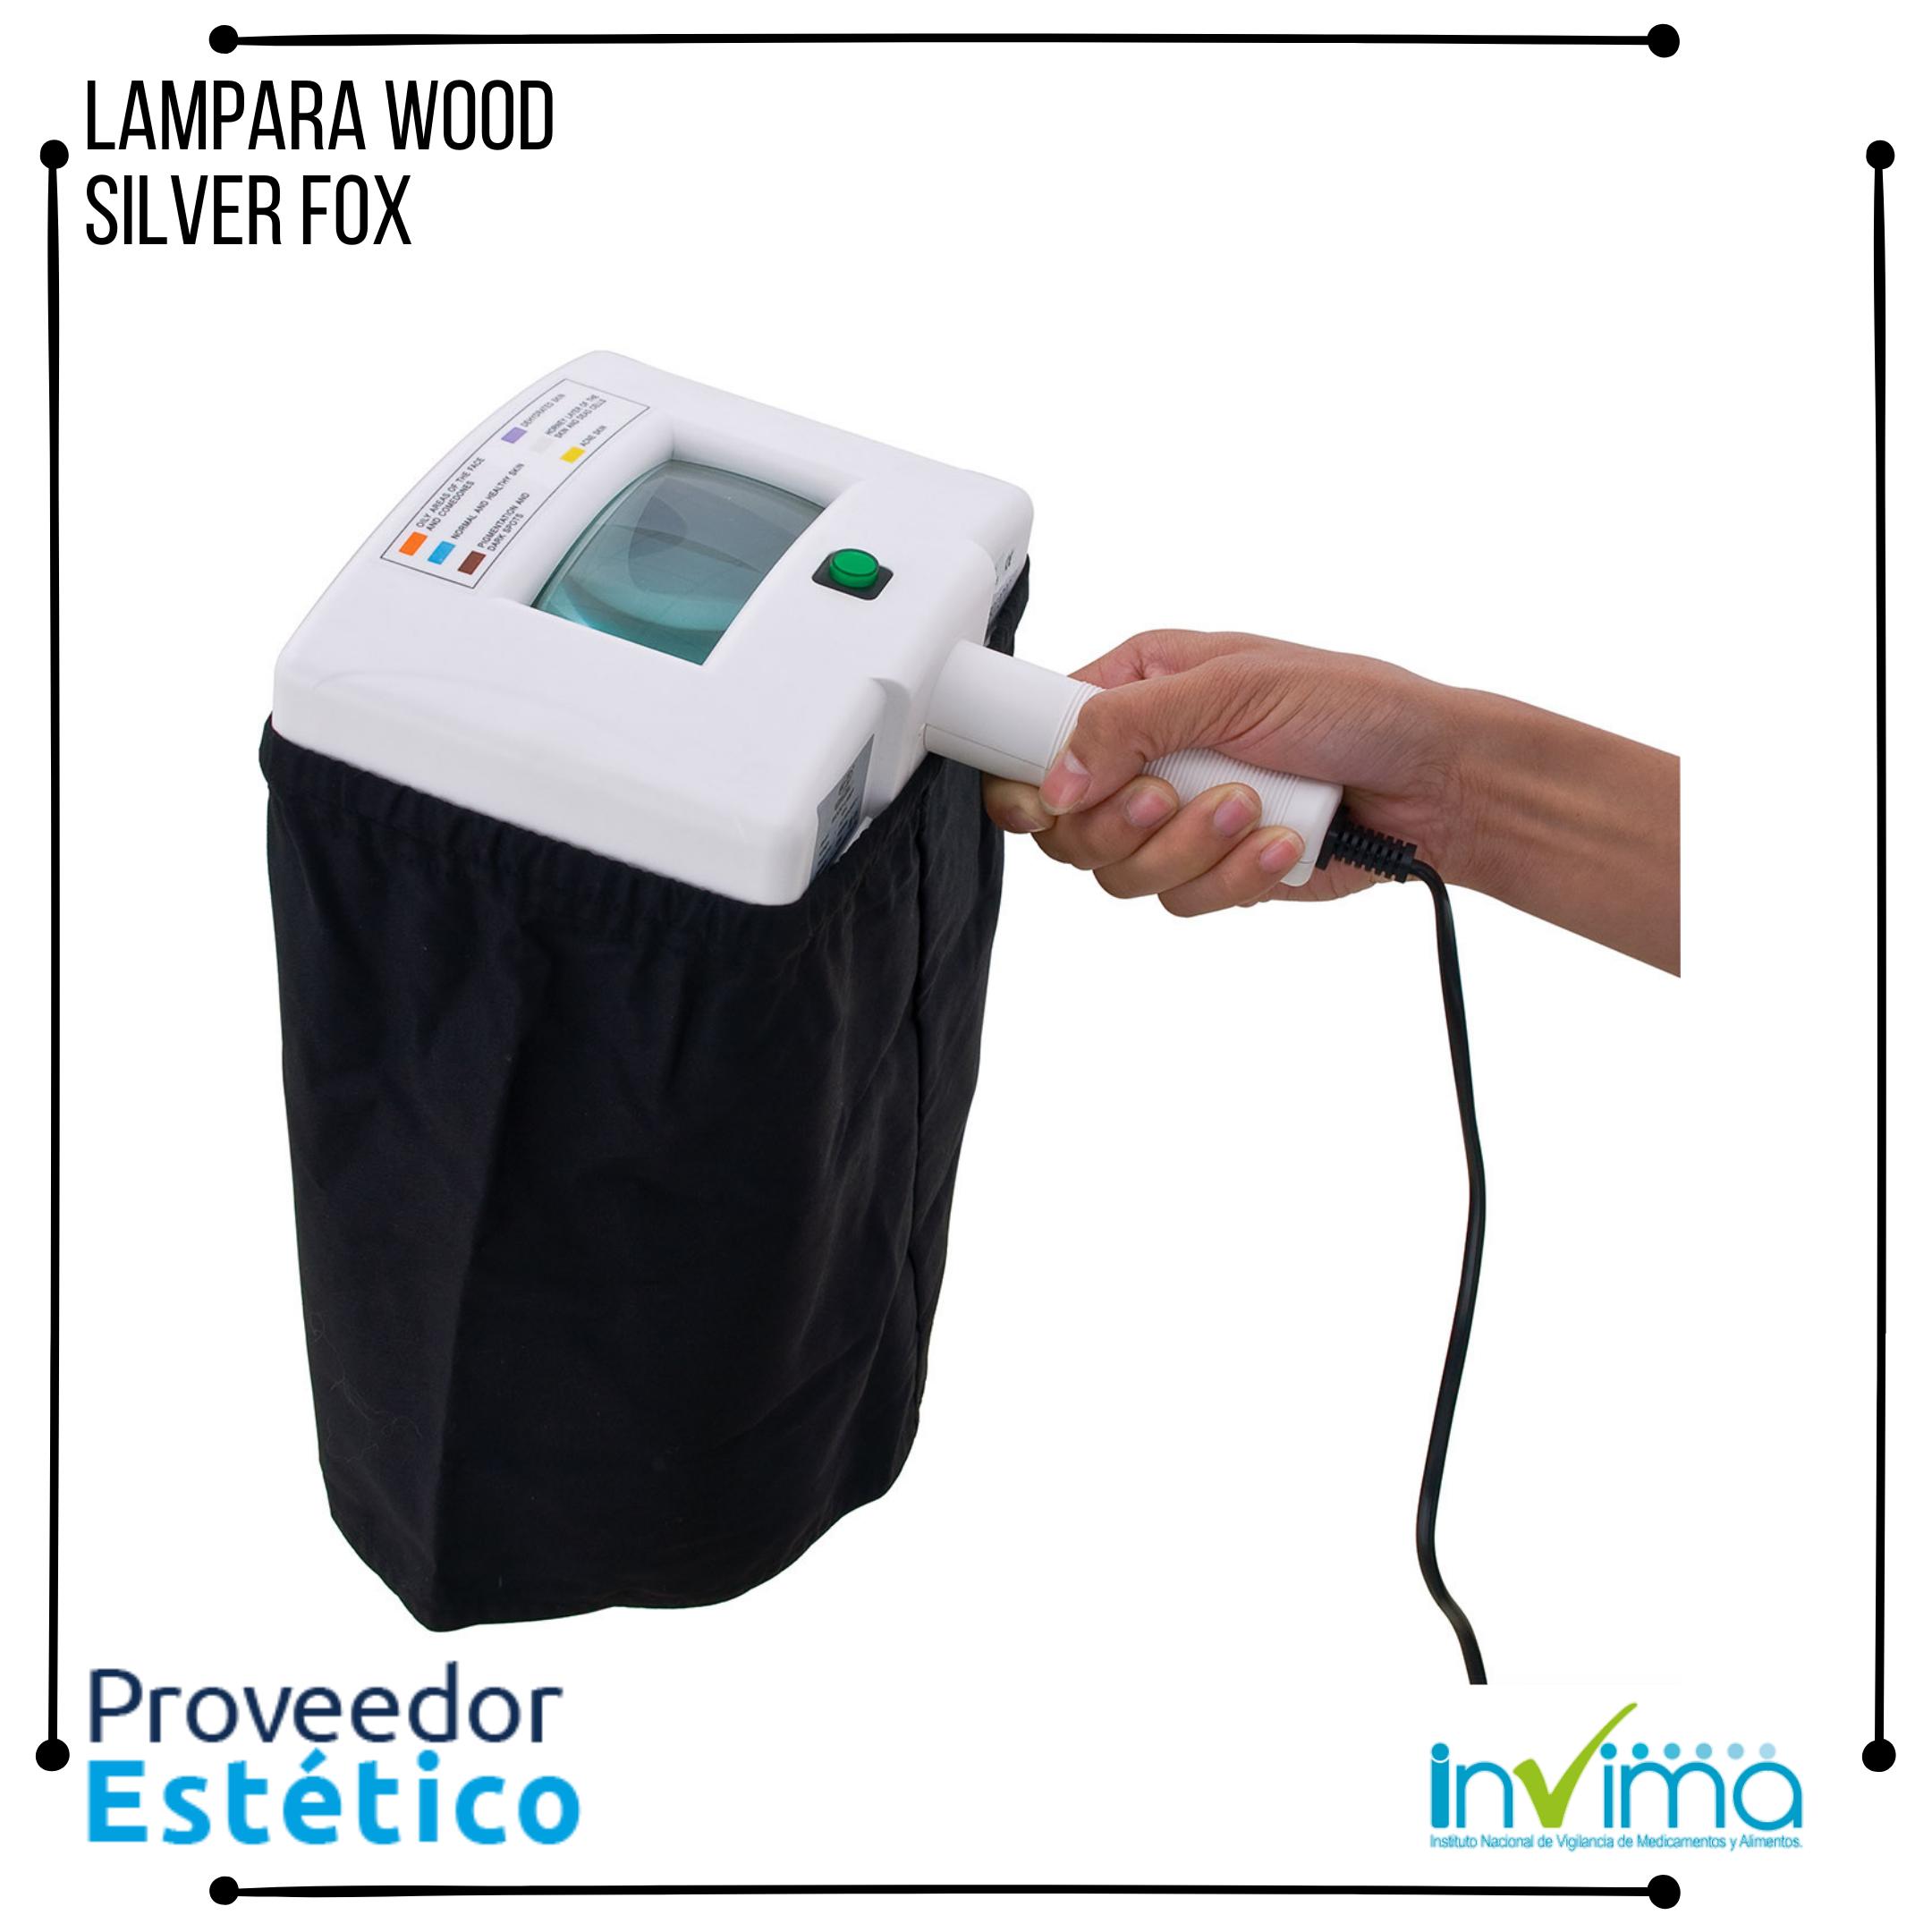 https://0201.nccdn.net/4_2/000/000/083/84e/lampara-wood-silver-fox--1-.png